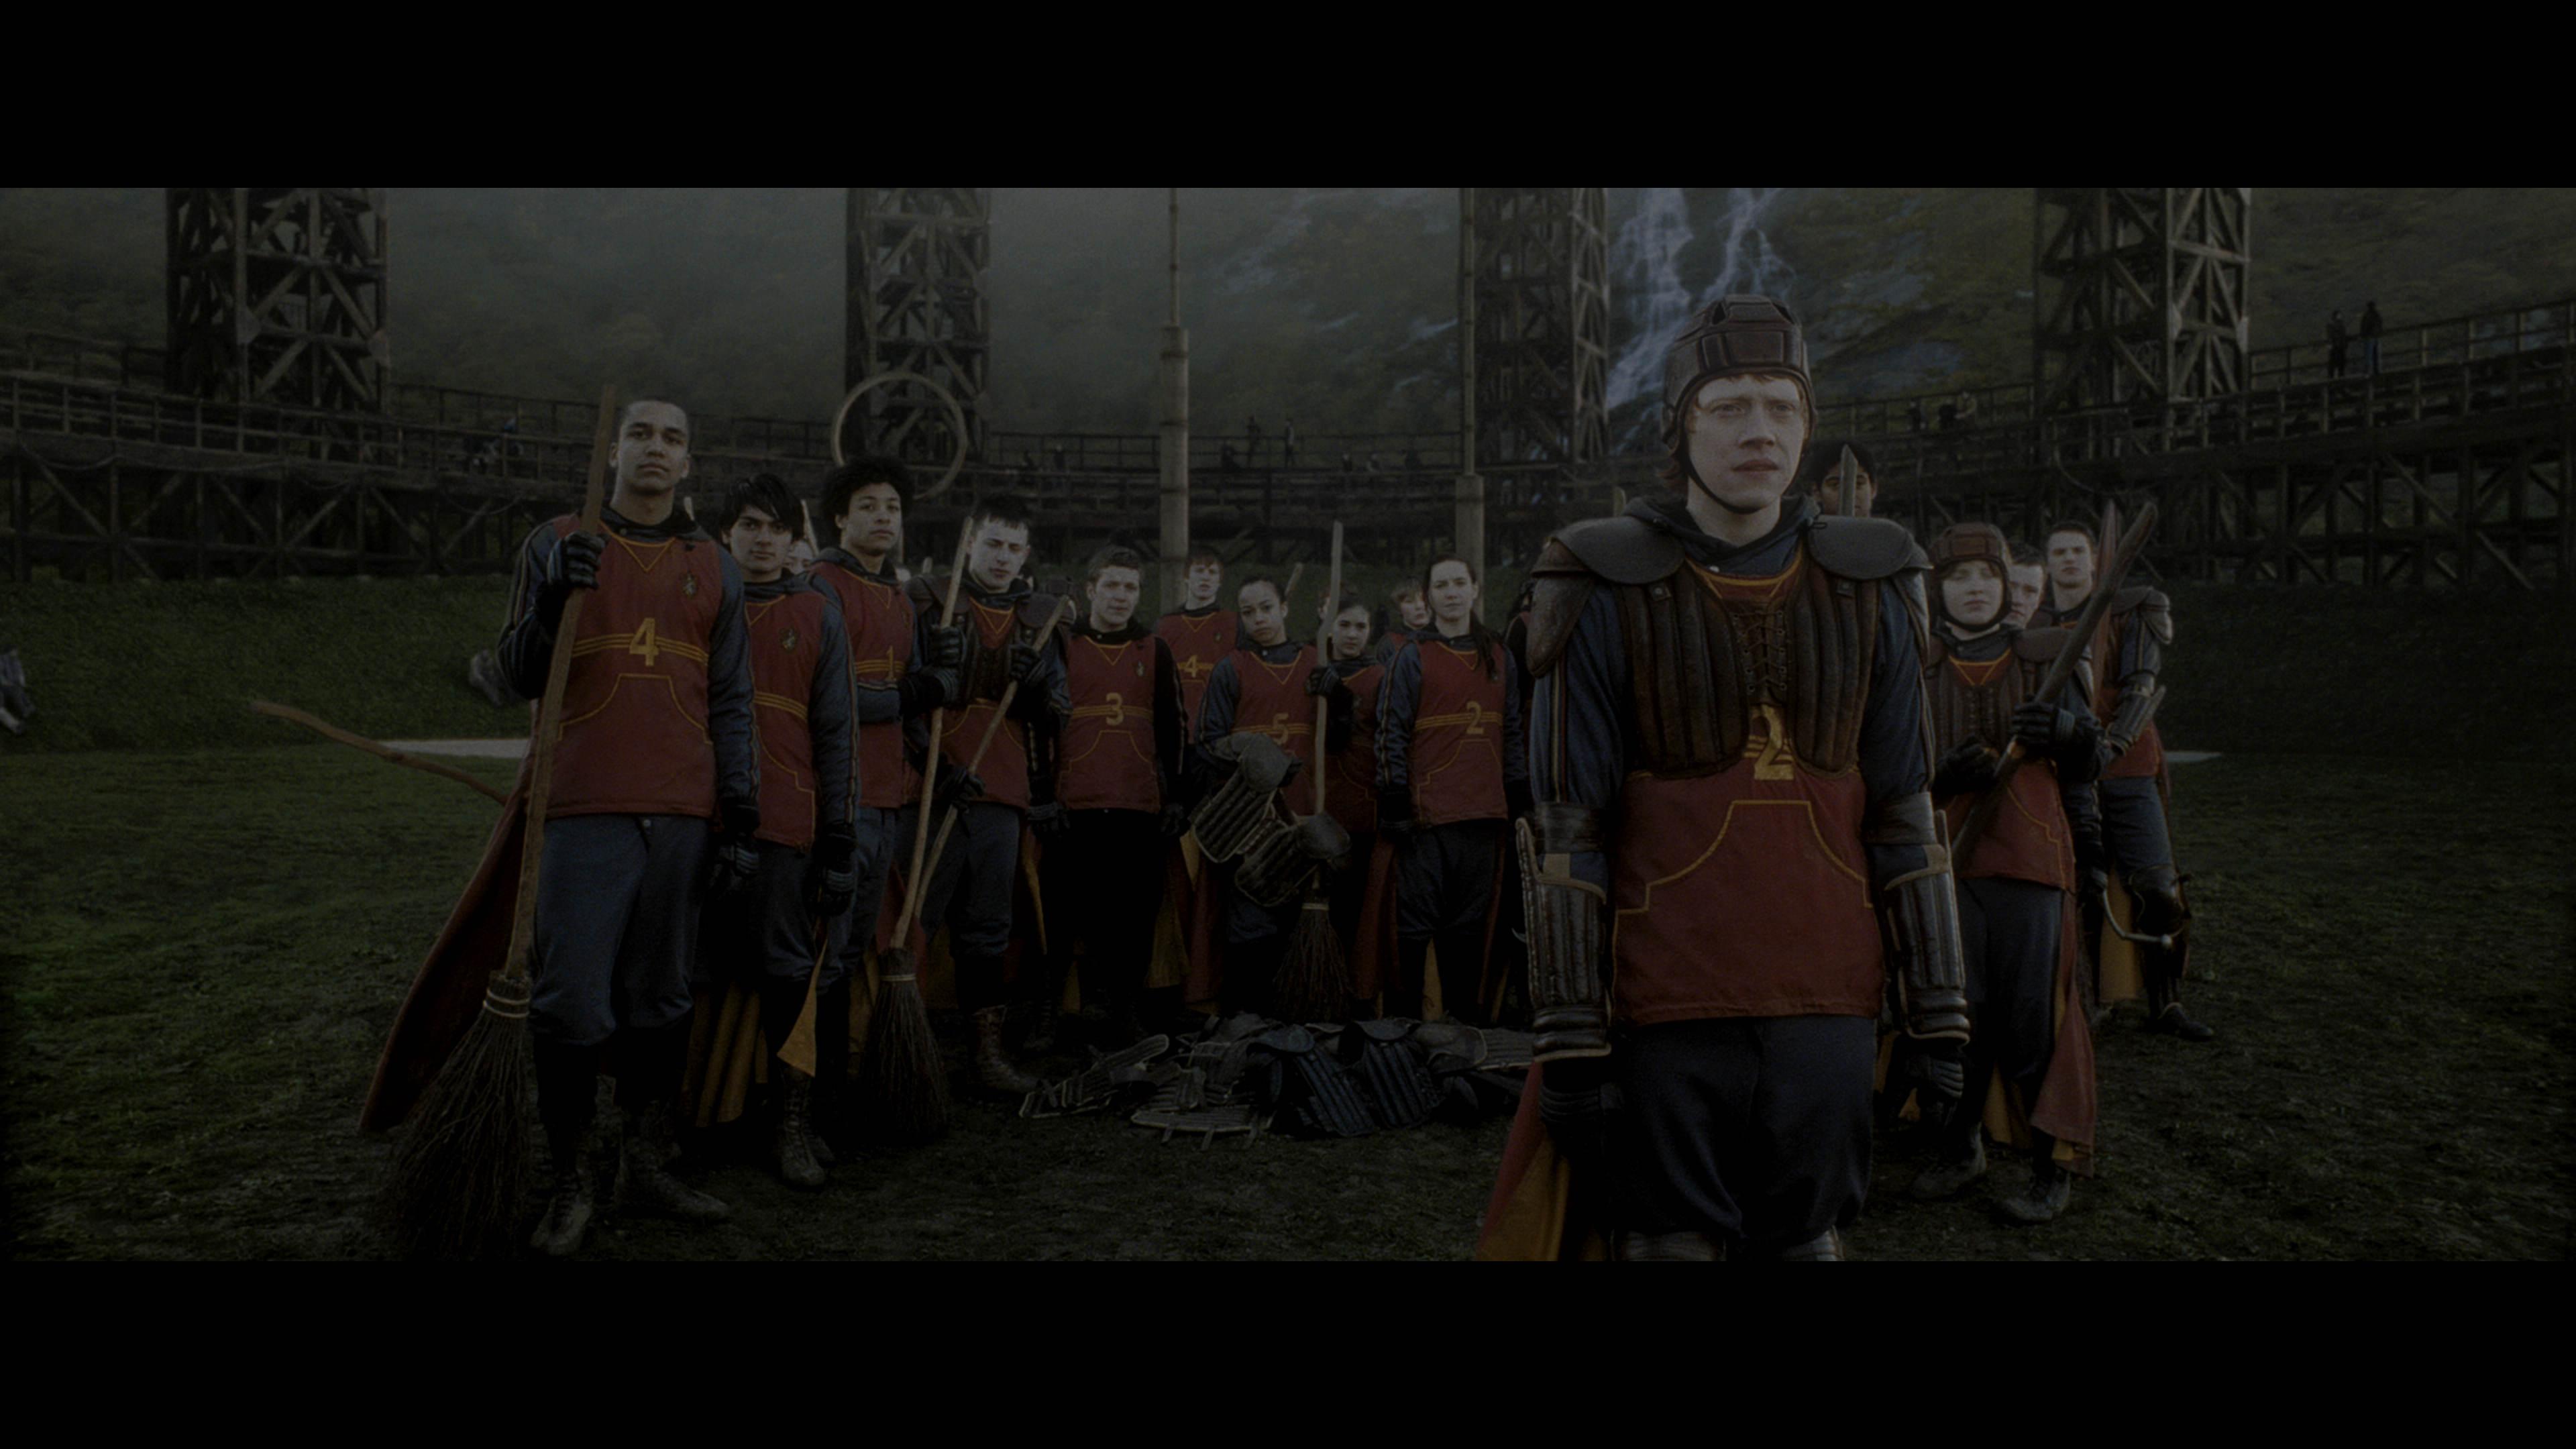 Гарри Поттер и Принц-полукровка / Harry Potter and the Half-Blood Prince (2009/BDRemux) 2160p, 4K, HDR, D, P2, A